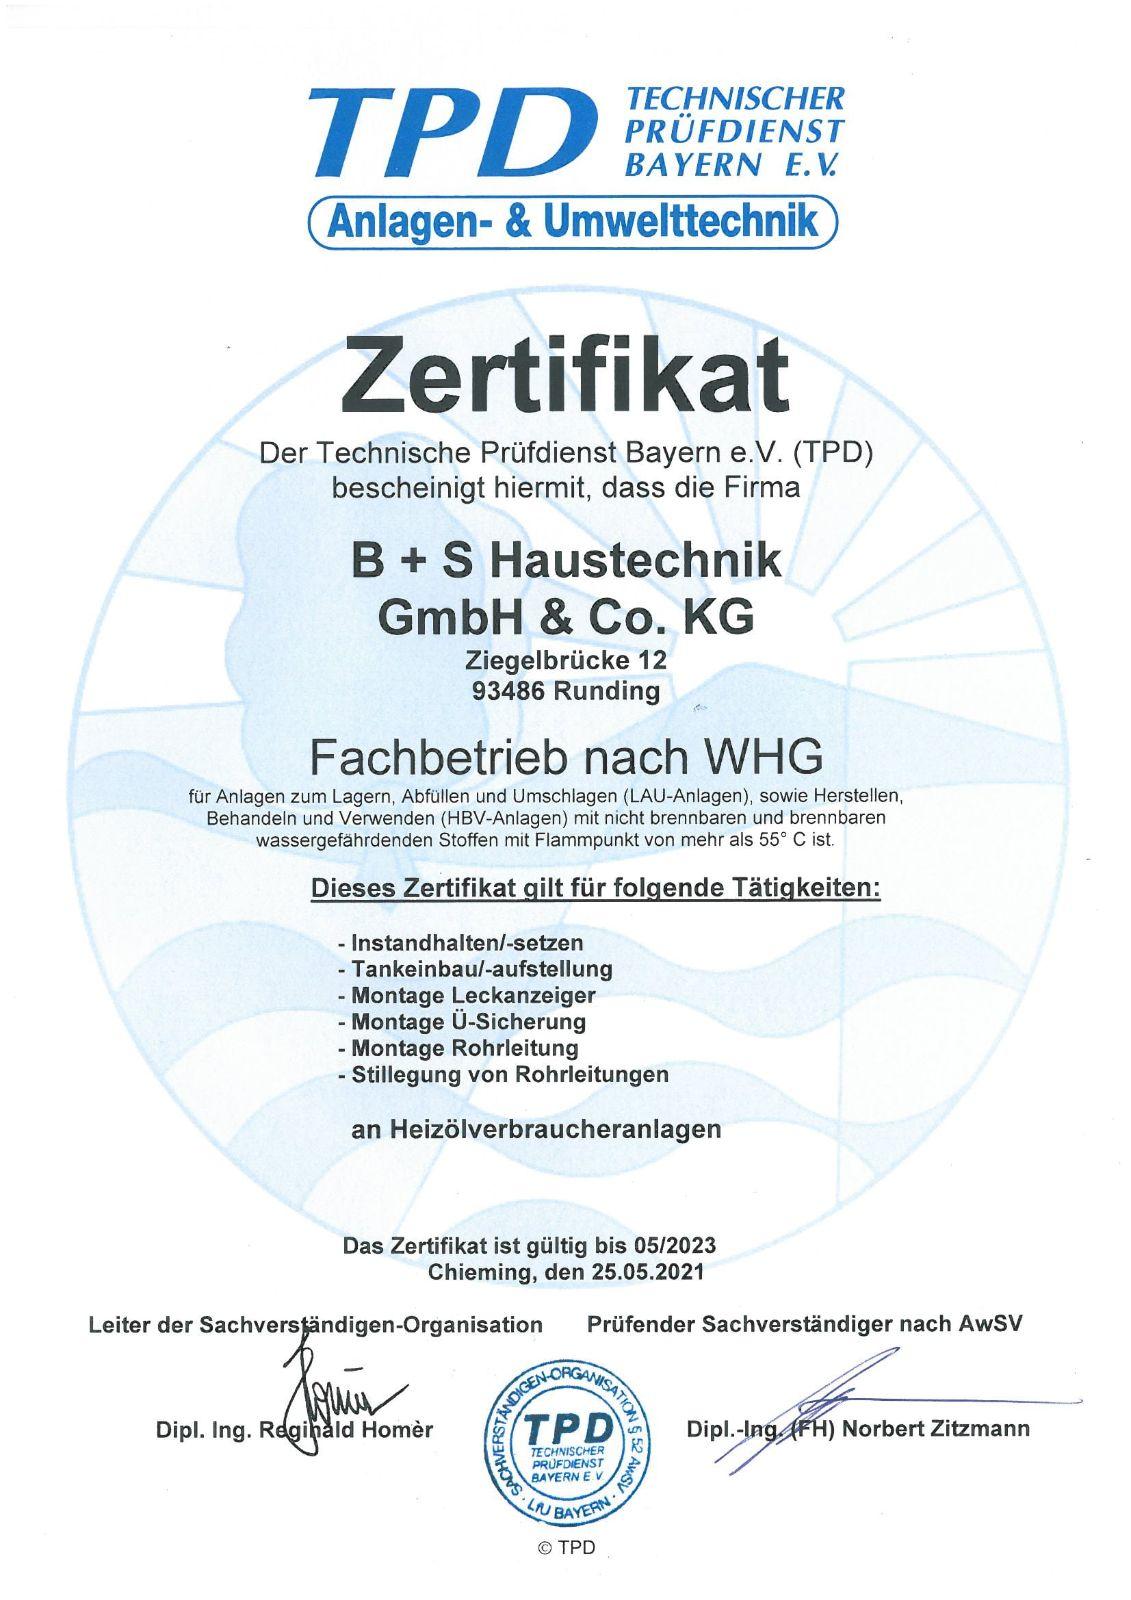 TPD-Zertifikat Fachbetrieb WHG-1